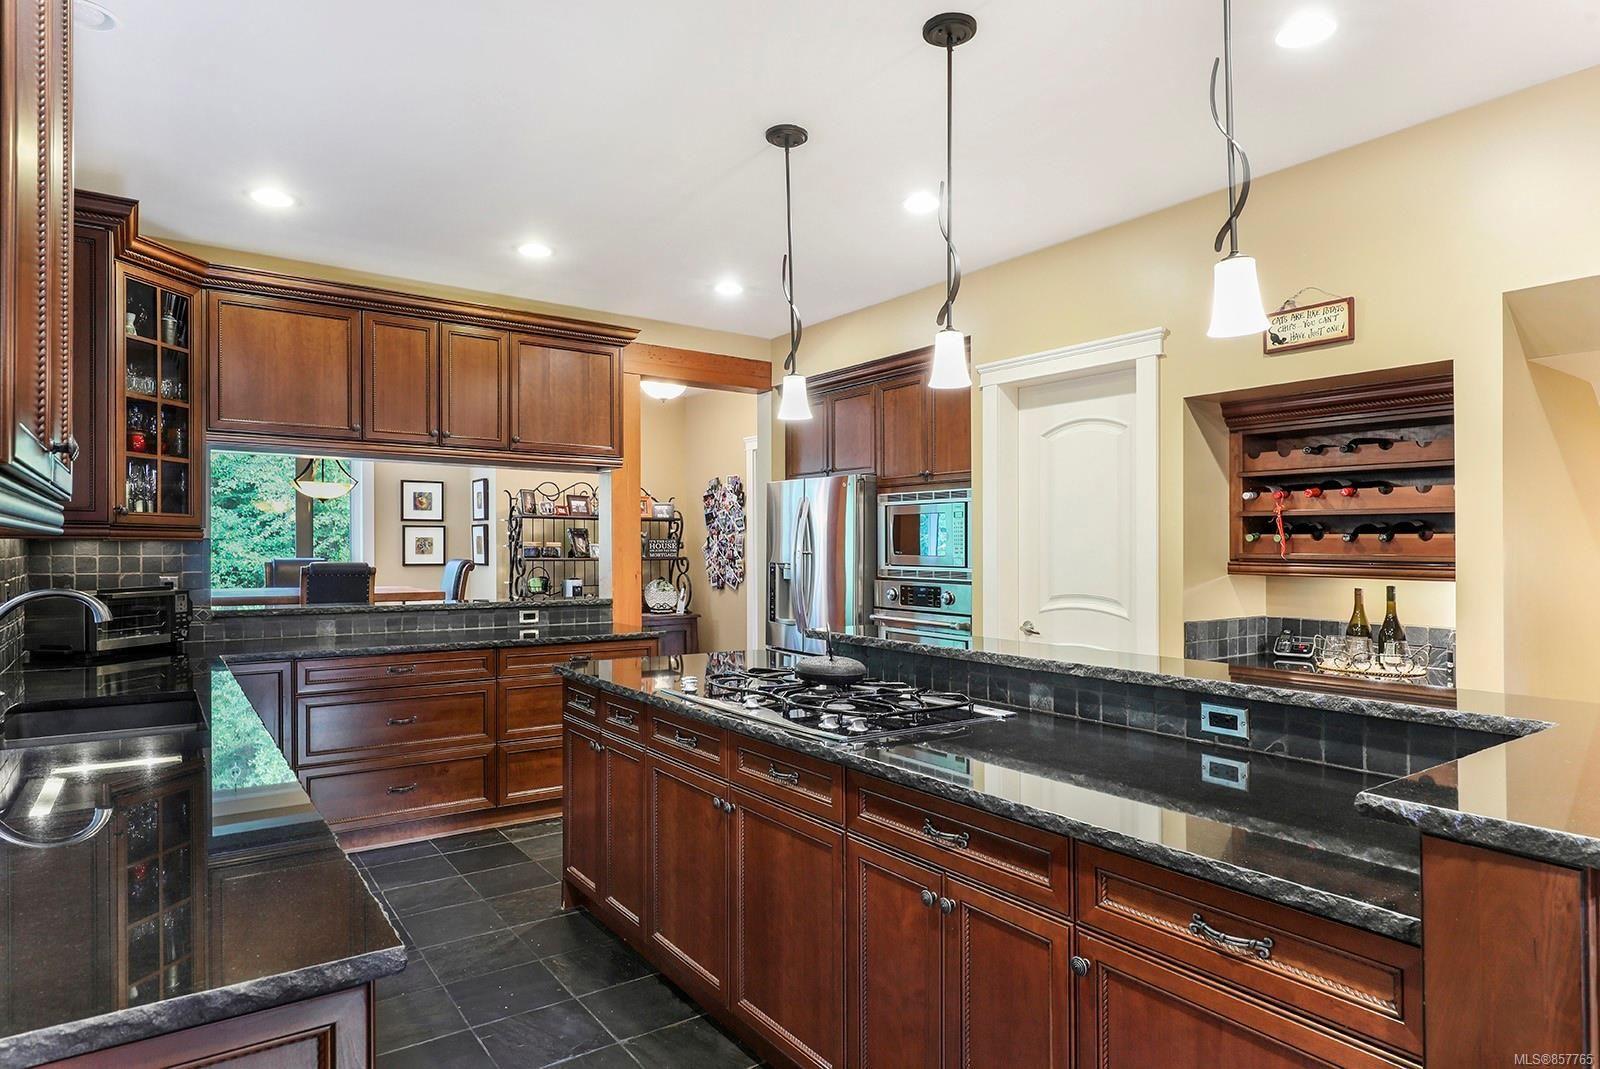 Photo 8: Photos: 1516 Highridge Dr in : CV Comox (Town of) House for sale (Comox Valley)  : MLS®# 857765